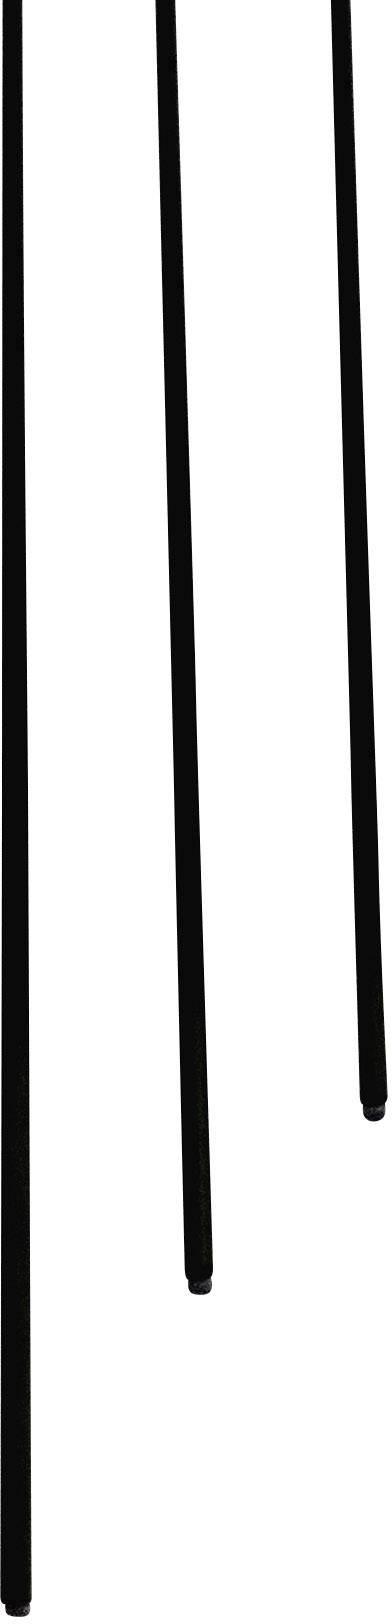 Pravouhlý profil Carbotec 236146, (d x š x v) 500 x 8 x 0.8 mm